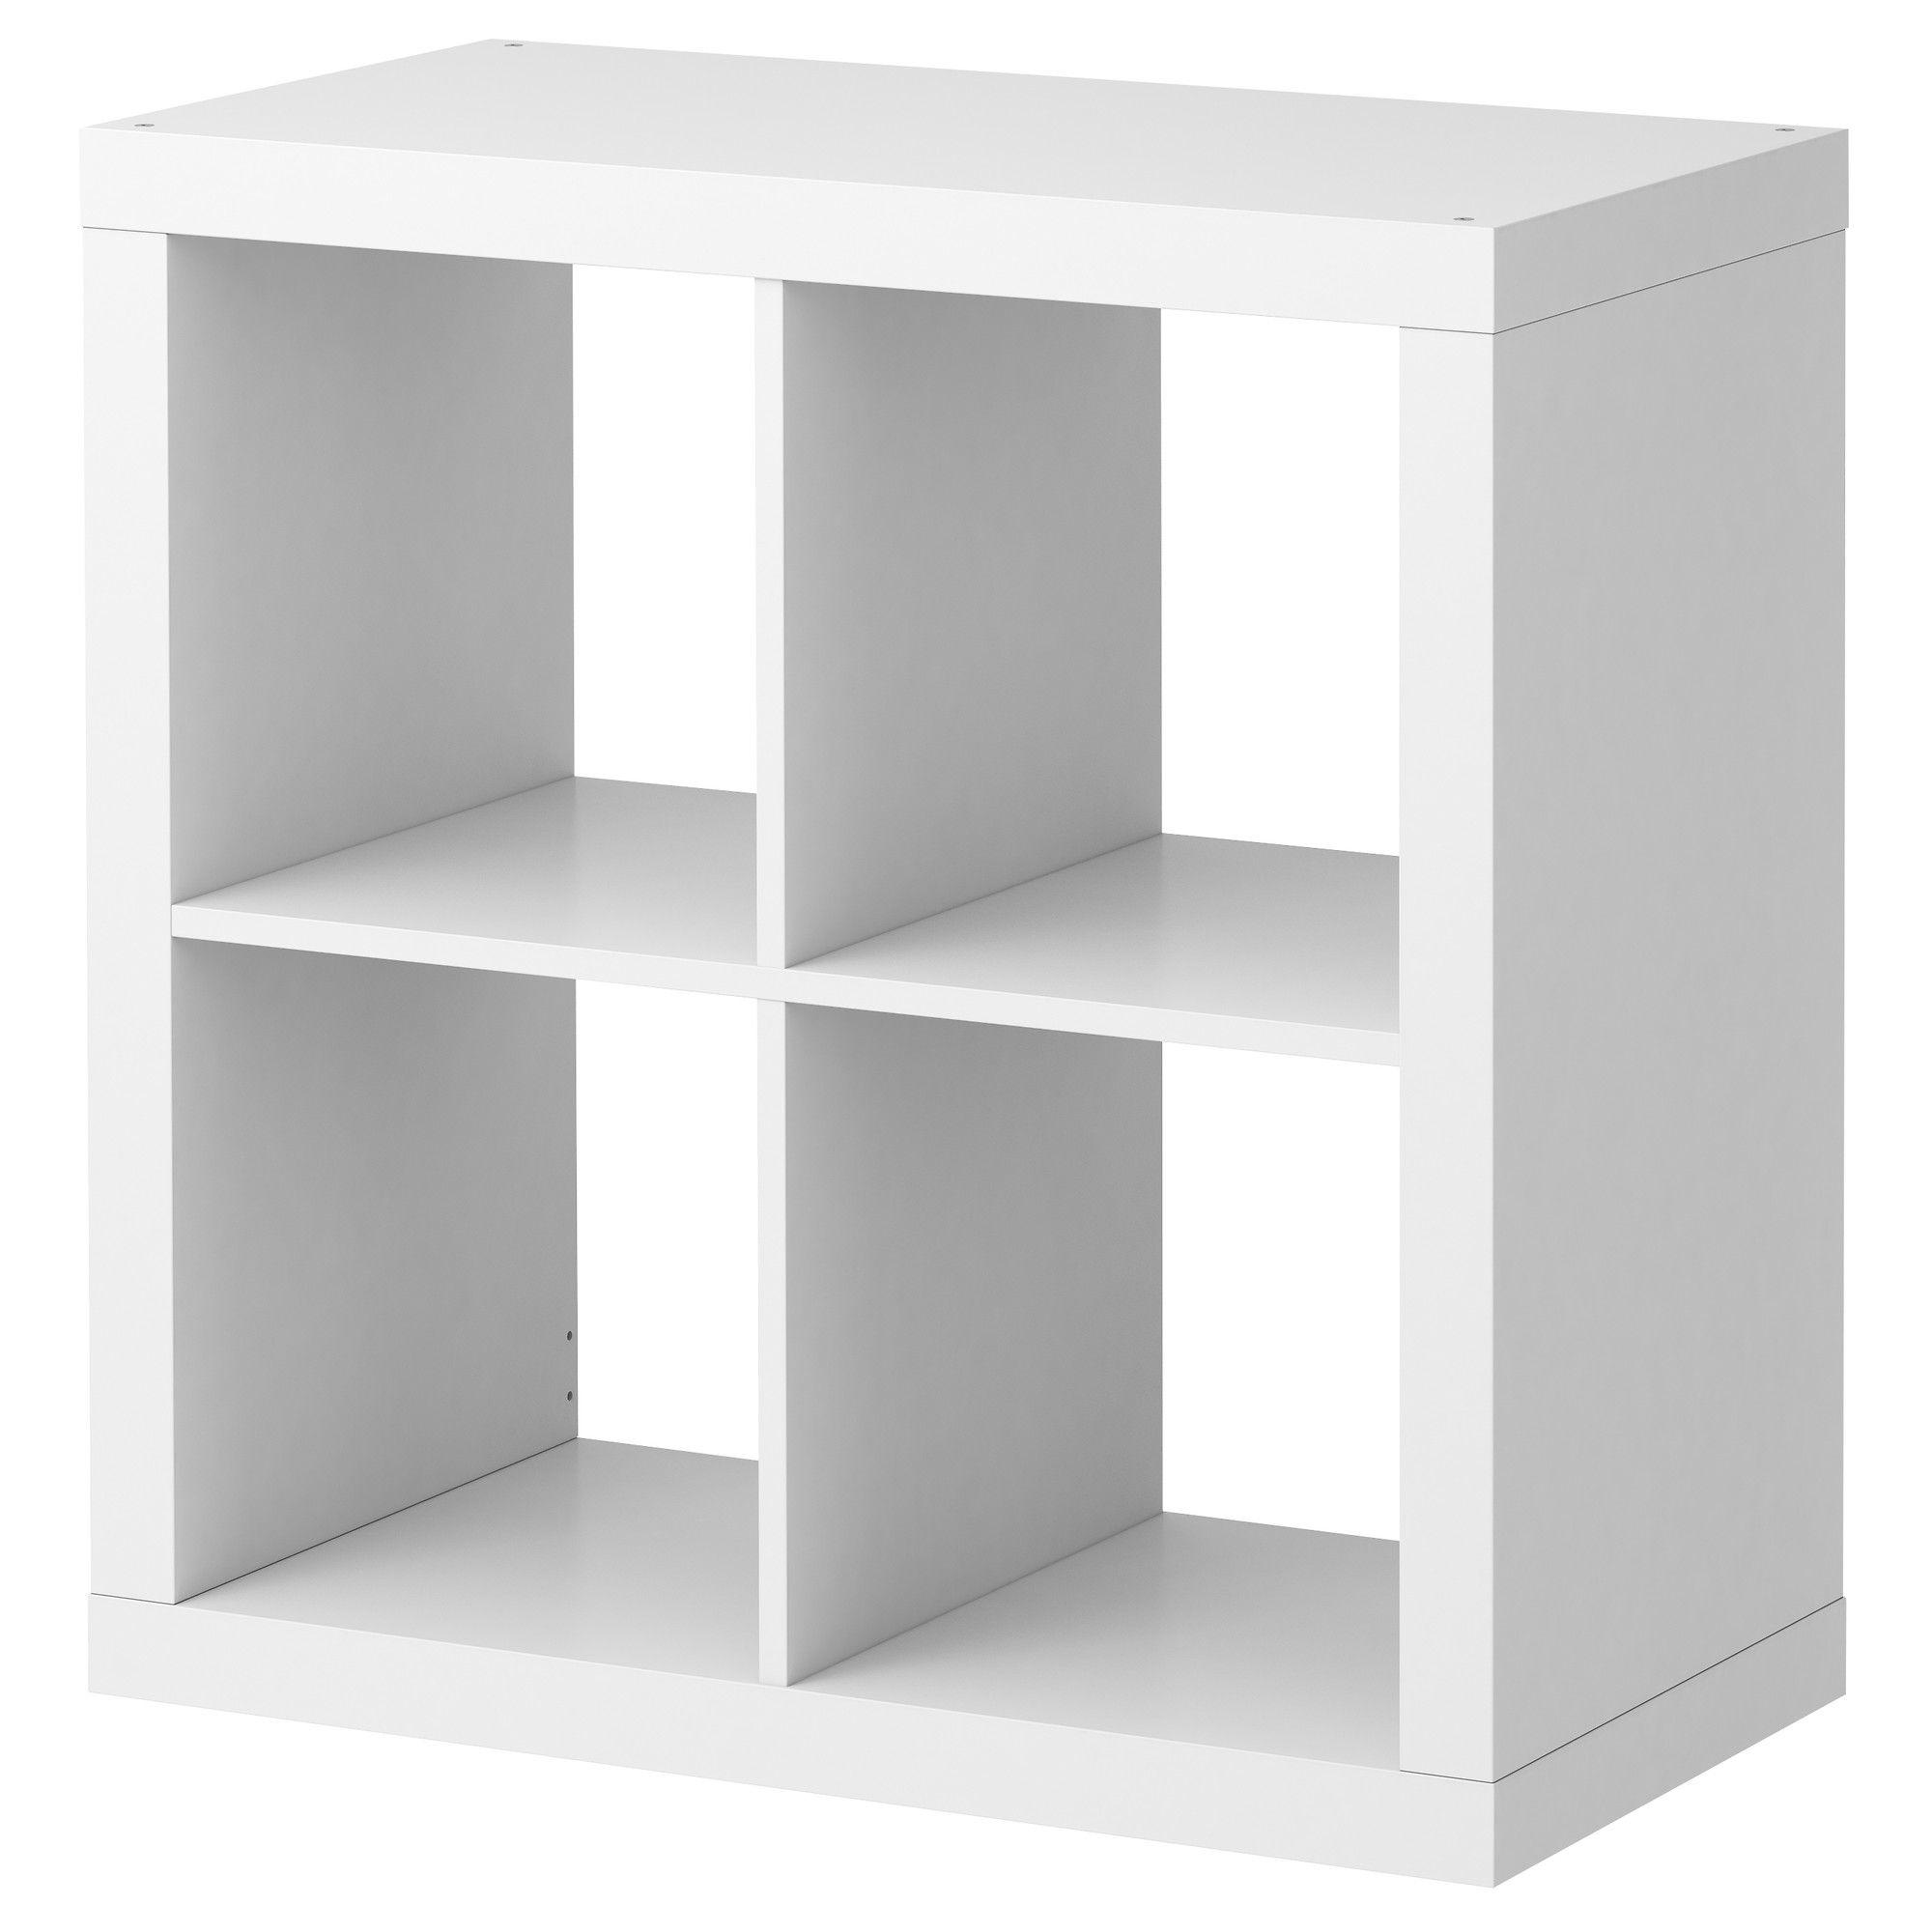 Ikea Us Furniture And Home Furnishings Kallax Ikea Ikea Living Room Storage Painting Ikea Furniture